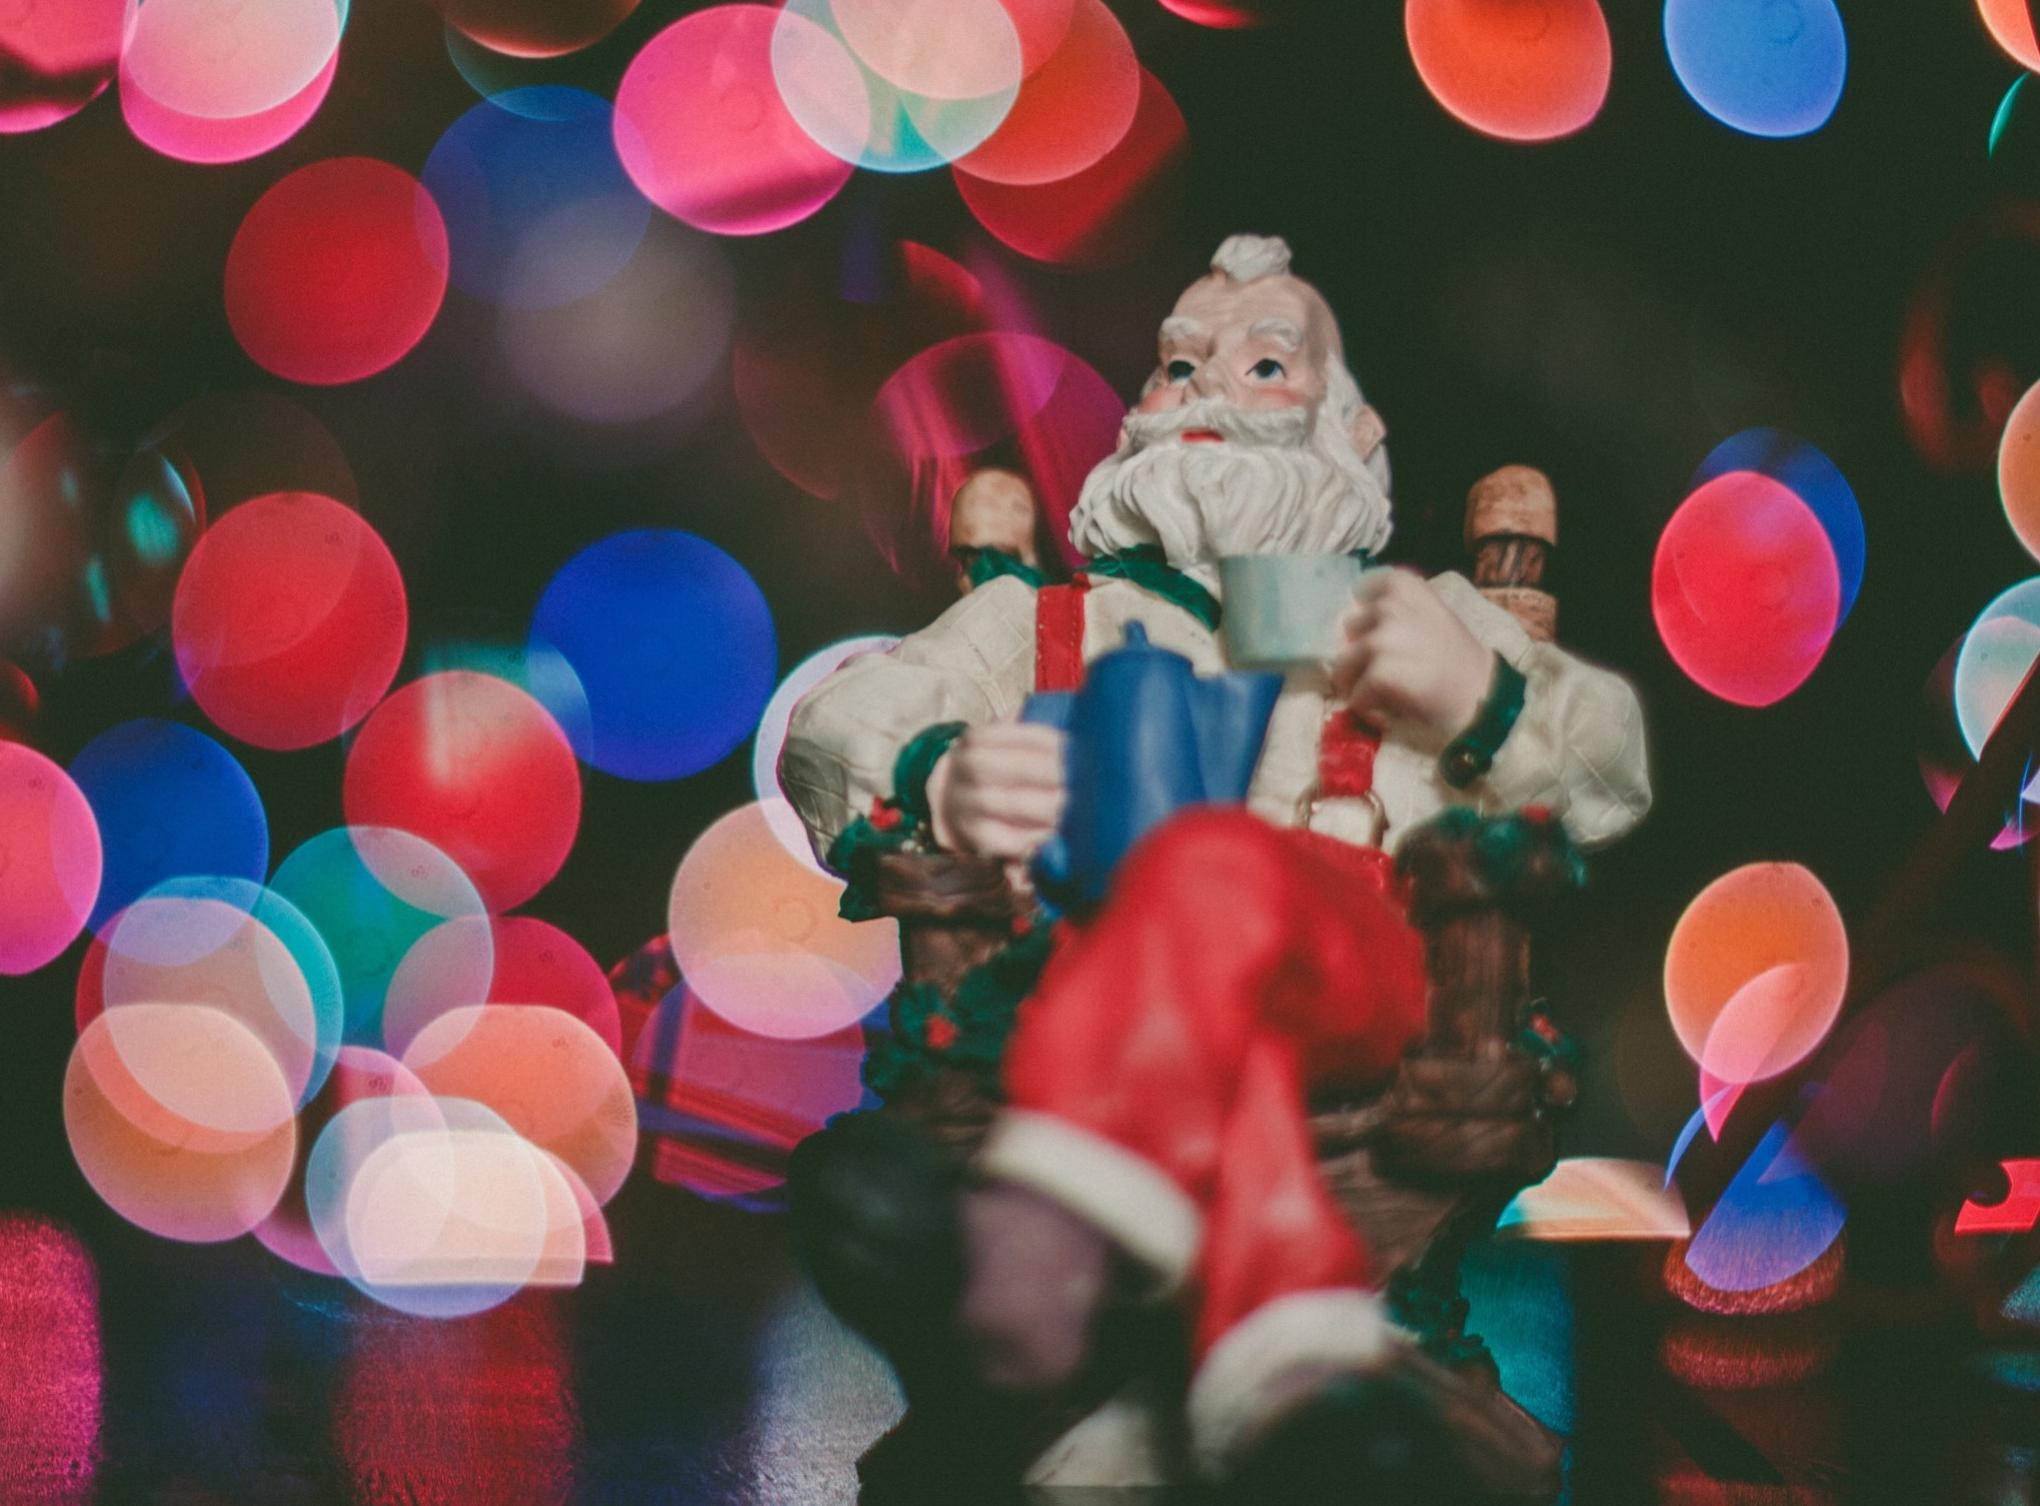 Santa Claus waiting Caleb Woods Unsplash